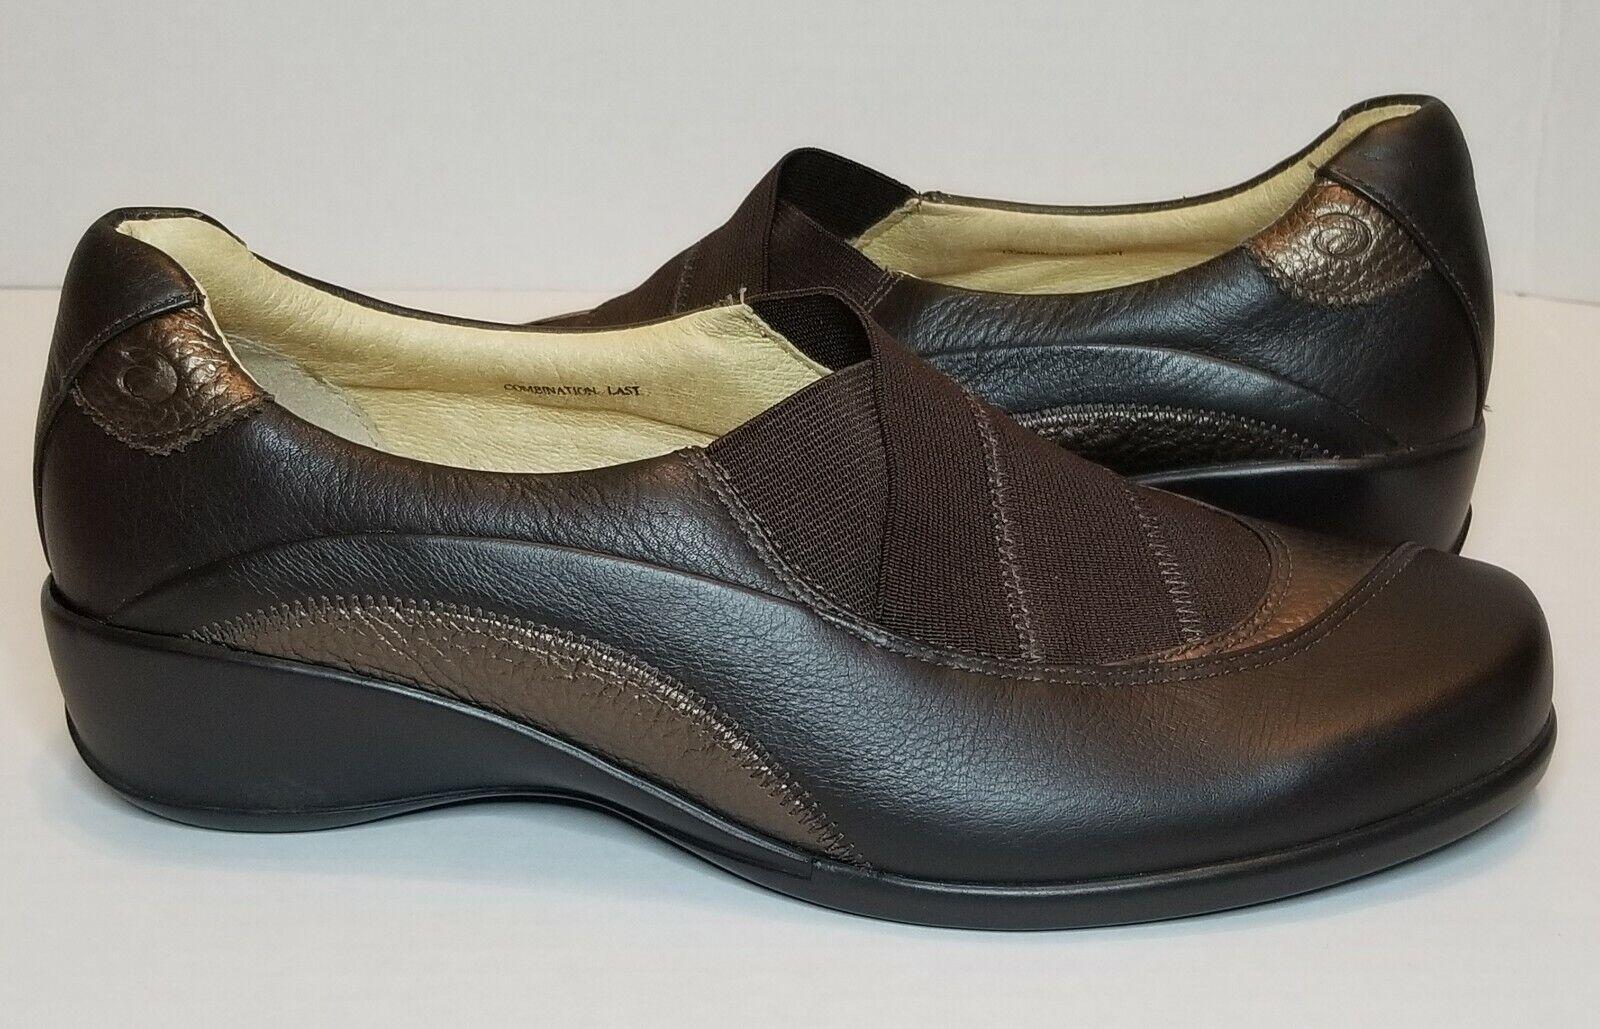 7B Aravon Tess Slip-On Loafer Women's Brown Shoes EUC WST04DB